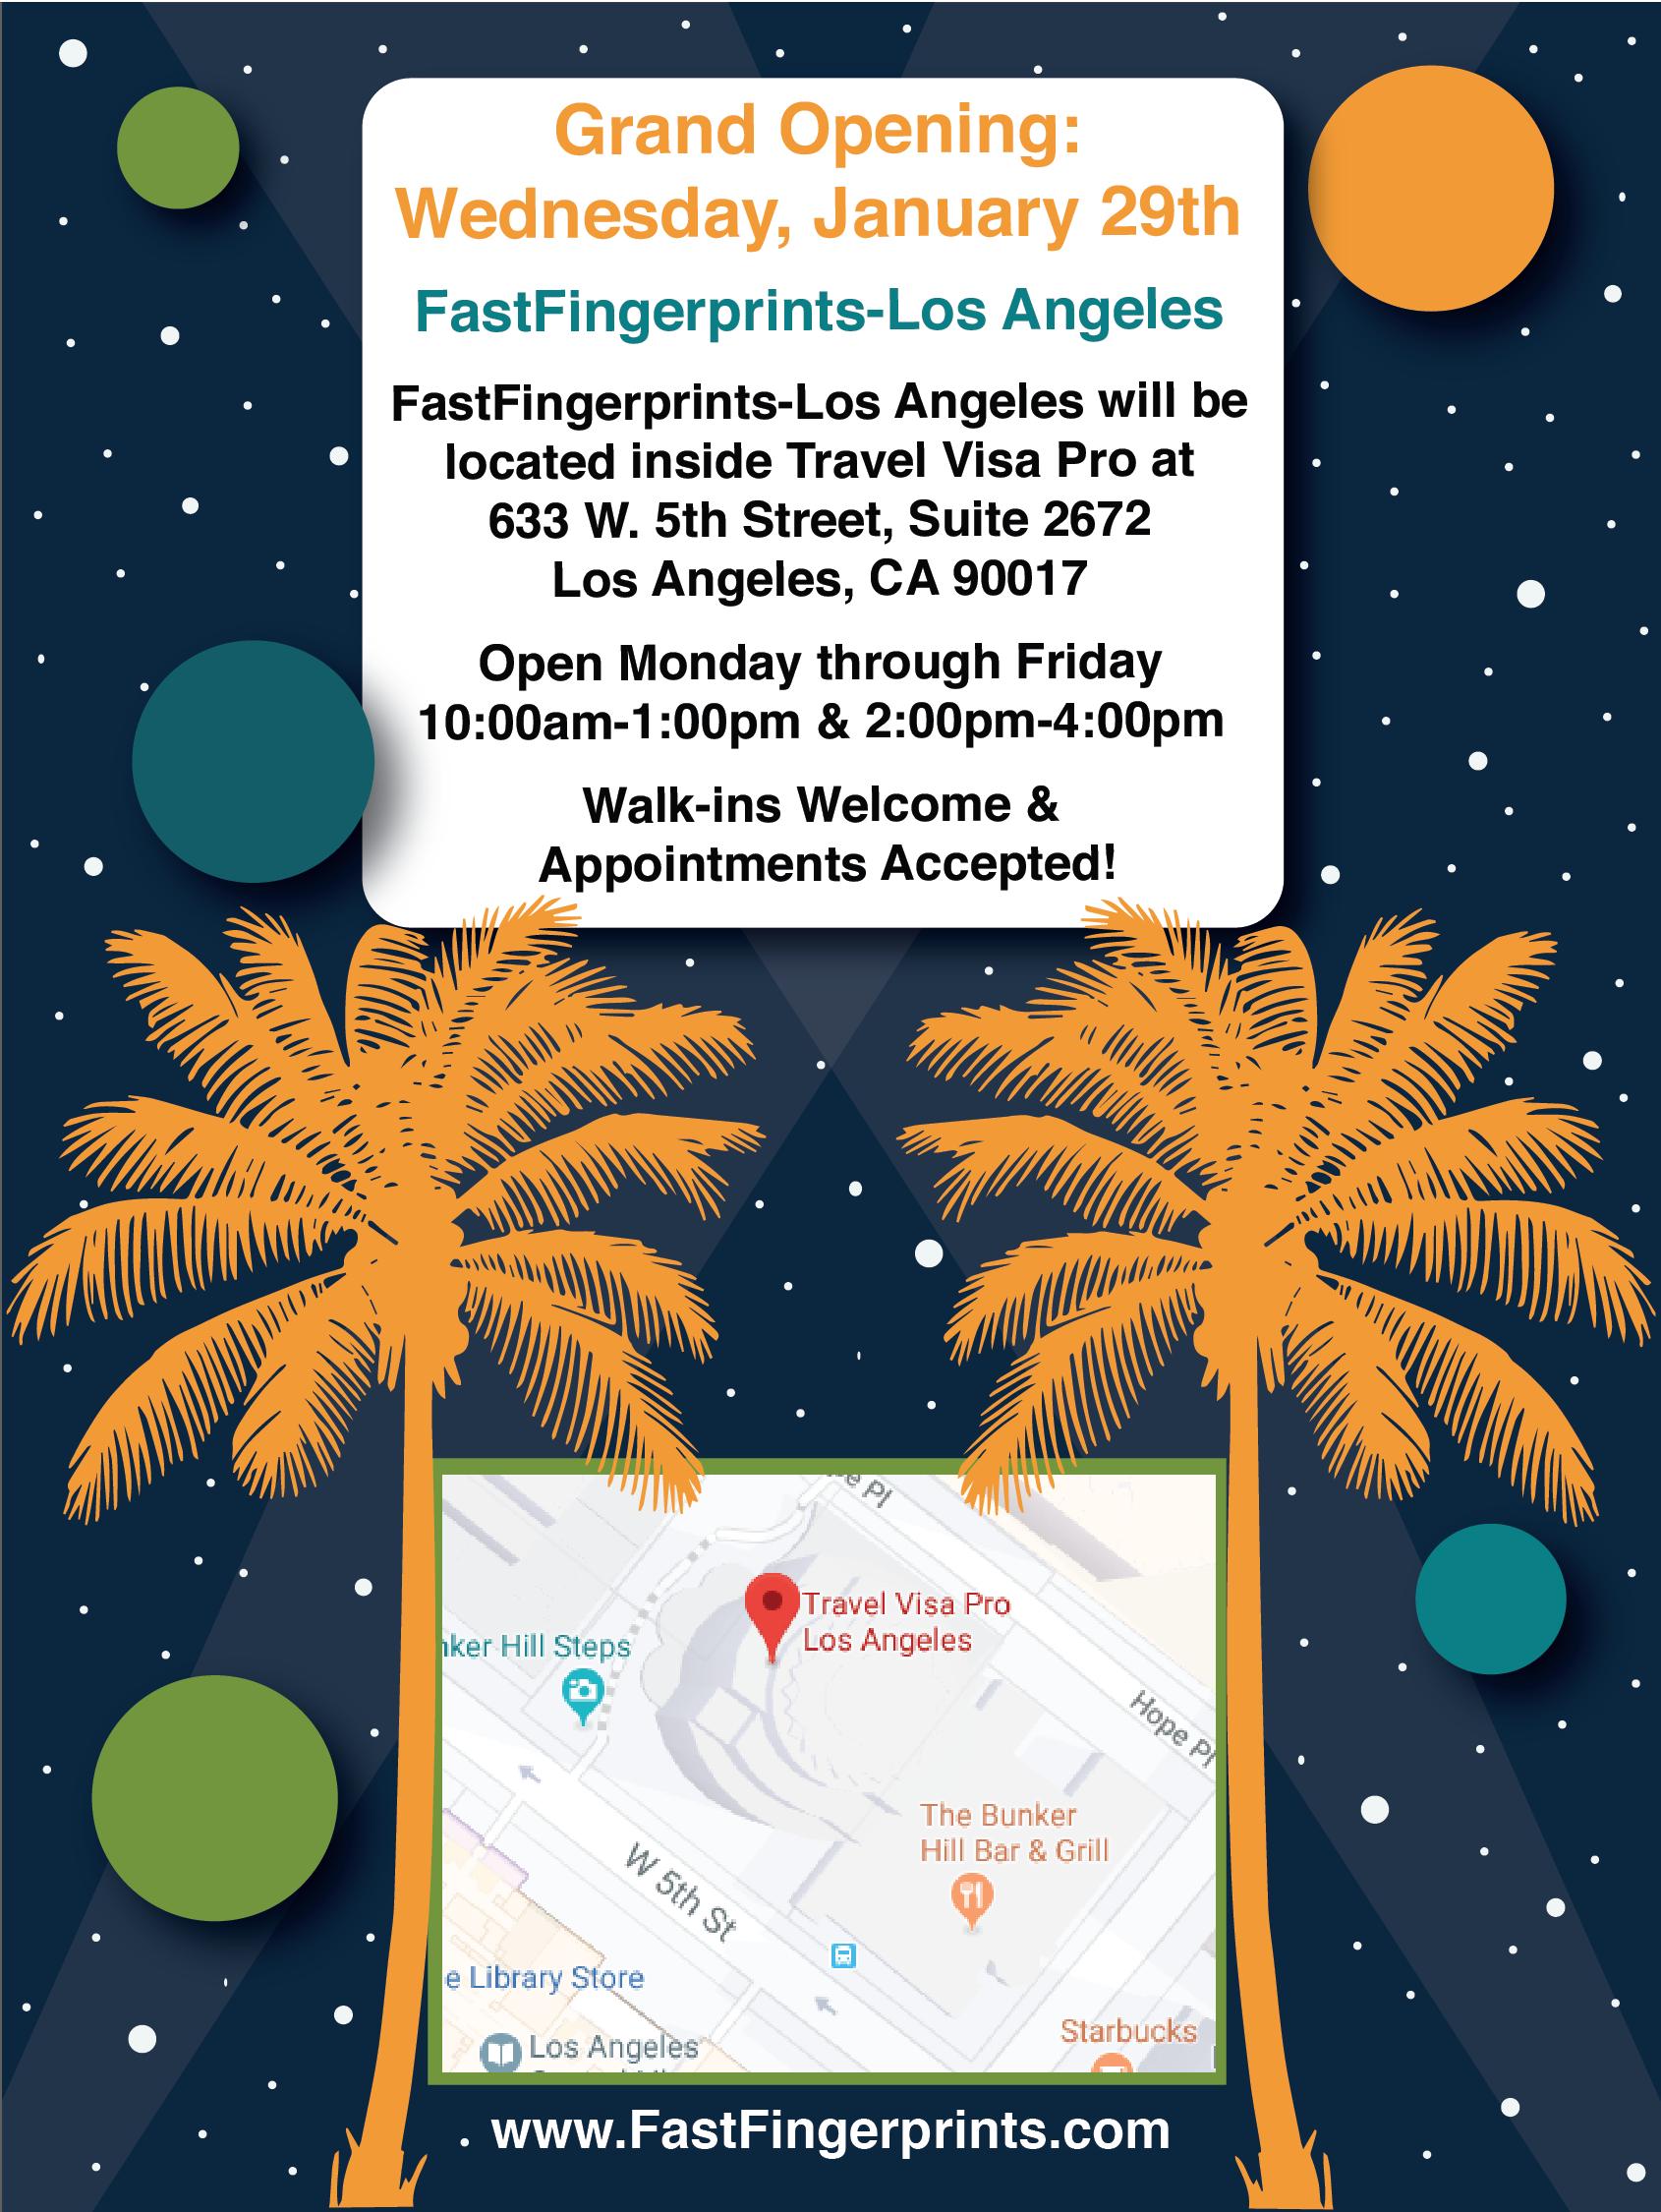 FastFingerprints (inside Travel Visa Pro) in Los Angeles